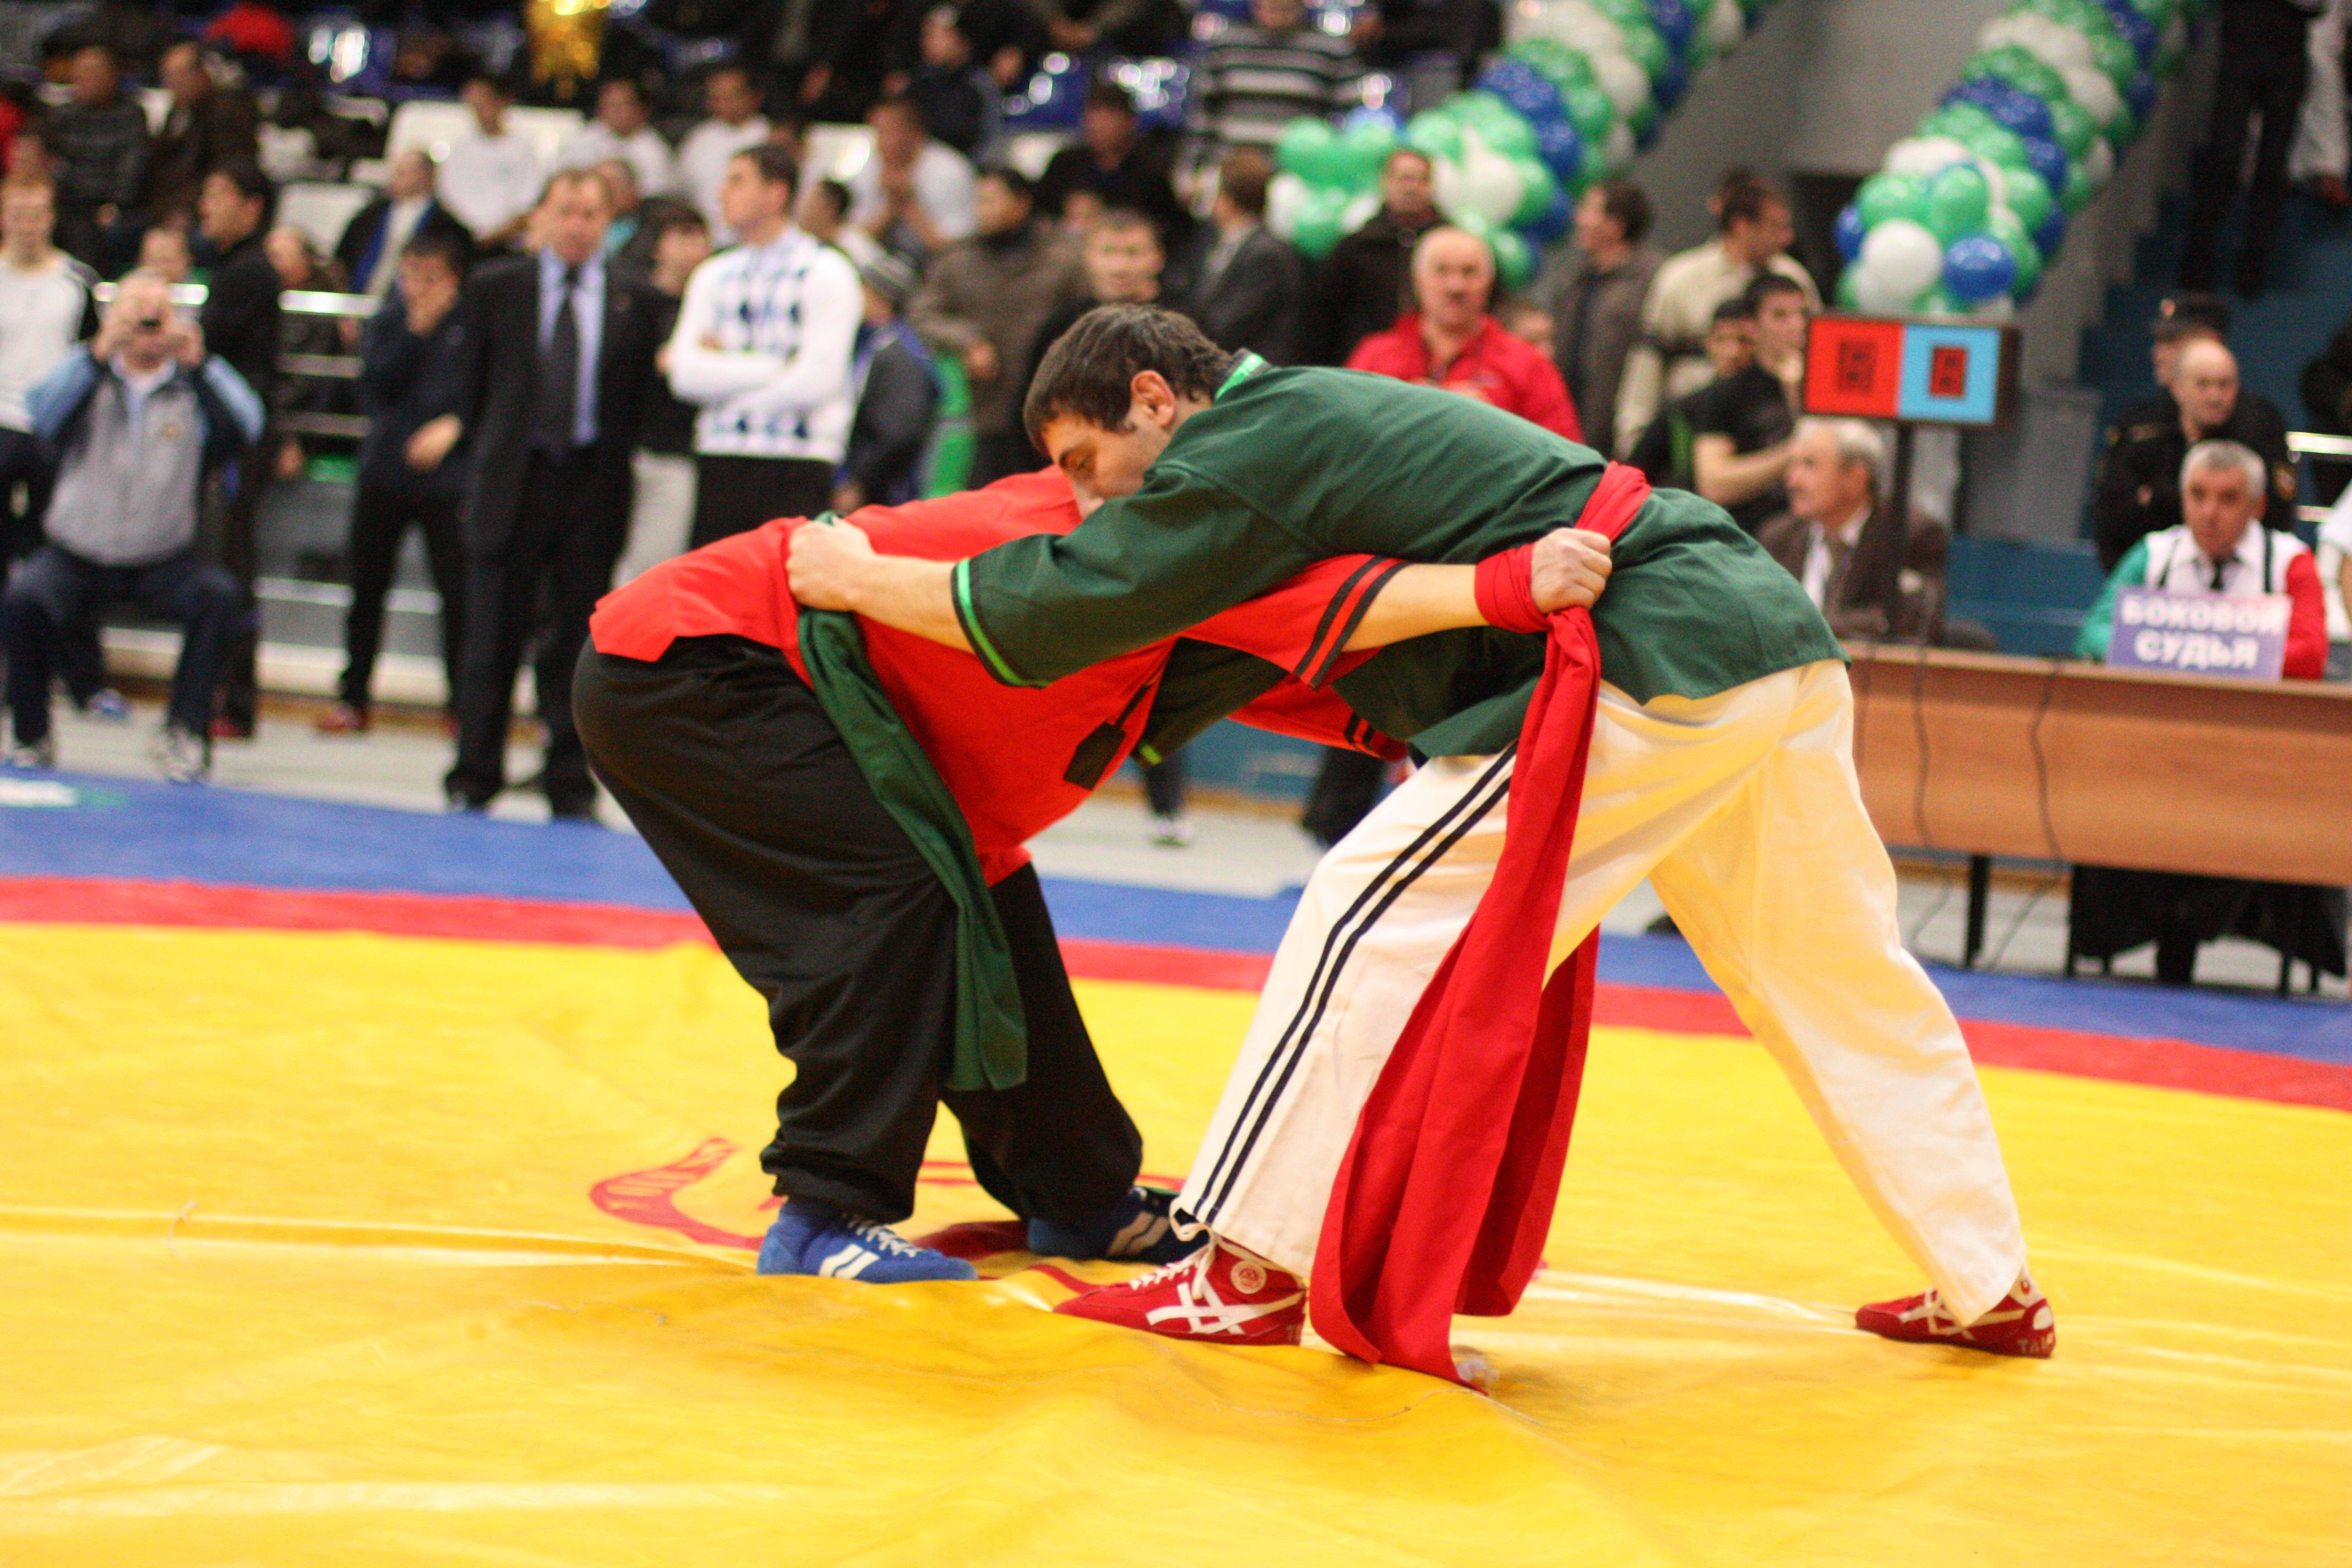 Корэш - Центр спортивной подготовки Республики Татарстан